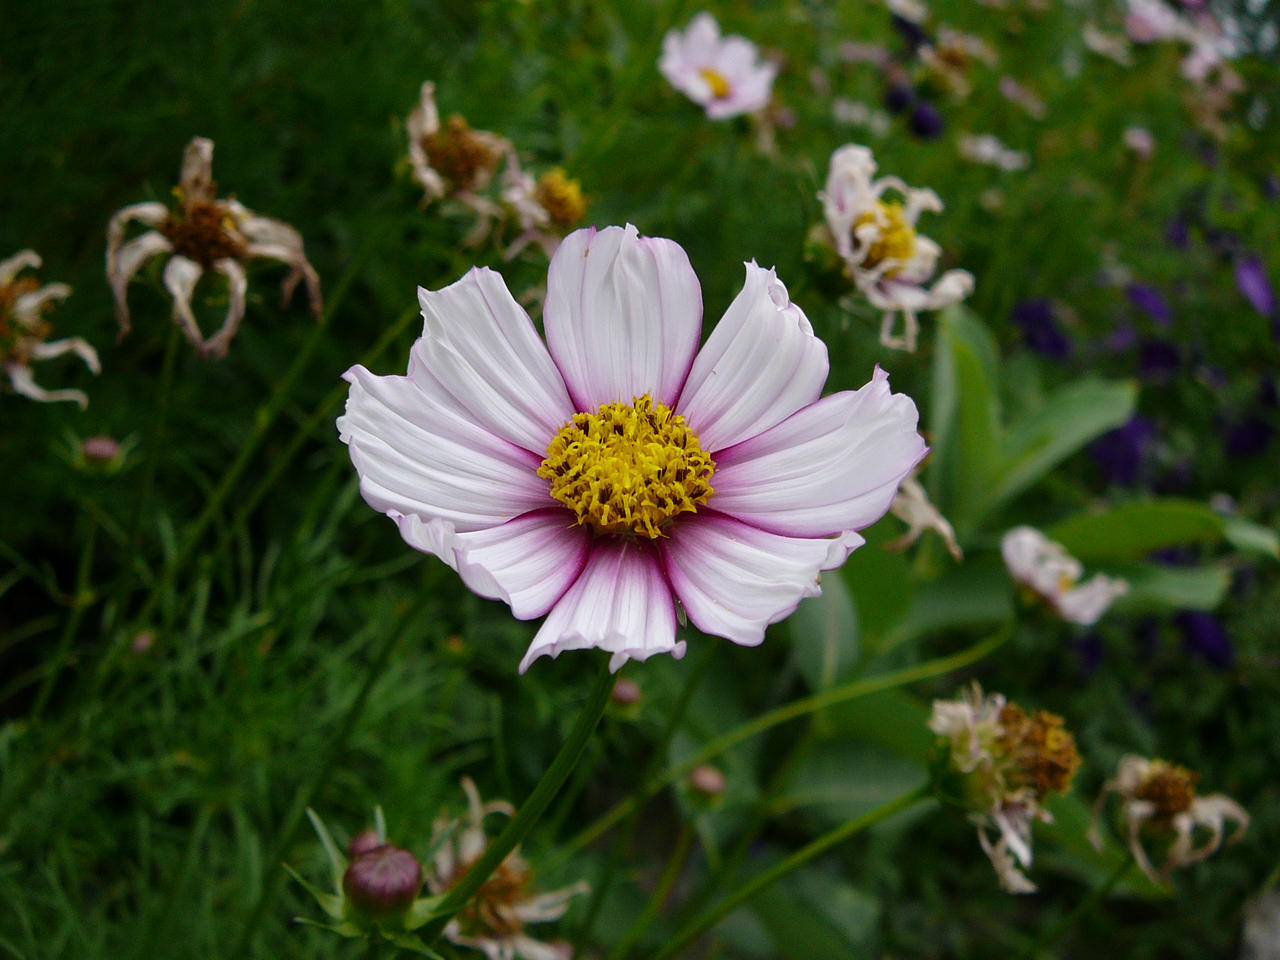 http://fc01.deviantart.net/fs17/i/2007/220/9/f/A_Living_Flower_Among_the_Dead_by_Enchantedgal_Stock.jpg